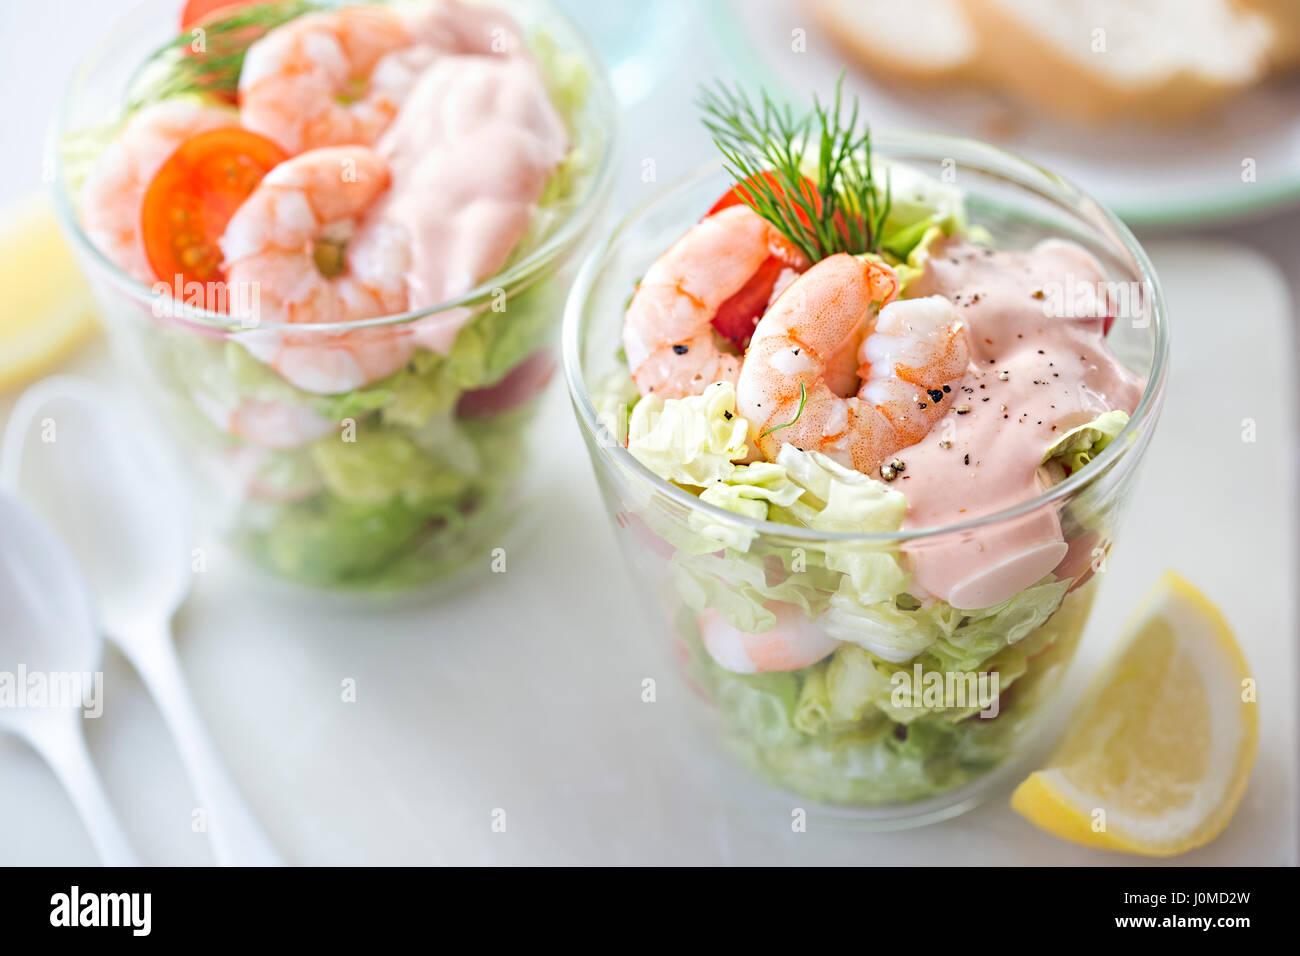 Crevetten-cocktail mit Salat, Tomaten, Dressing, Dill Stockfoto ...